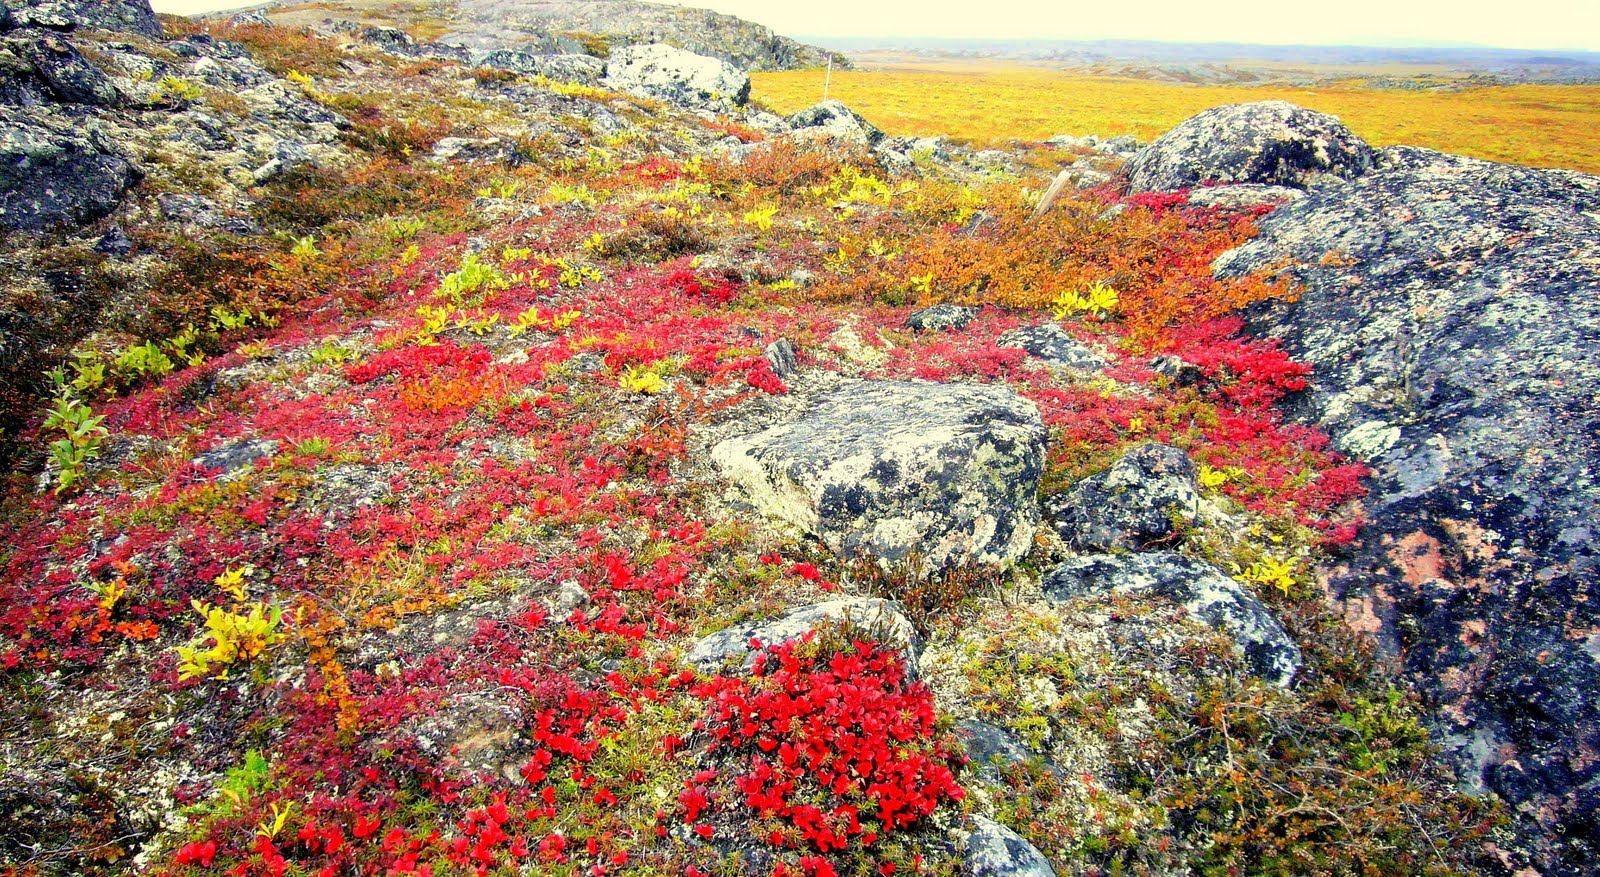 vegetation - Tundra